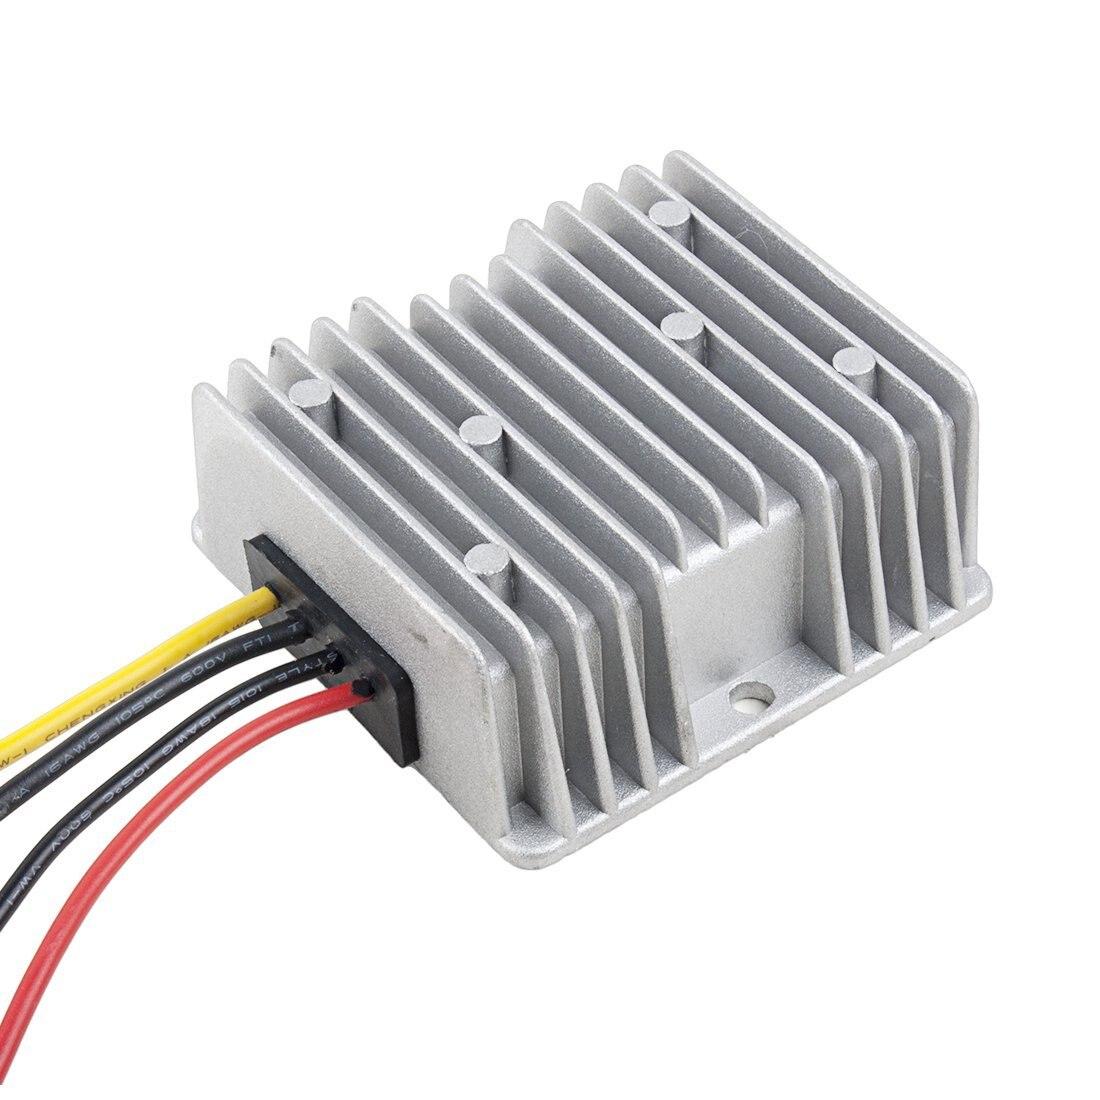 HOT-Power Converter Regulator DC12V/24V Step-Down to DC6V 15A 90W Waterproof Voltage Convert Transformer